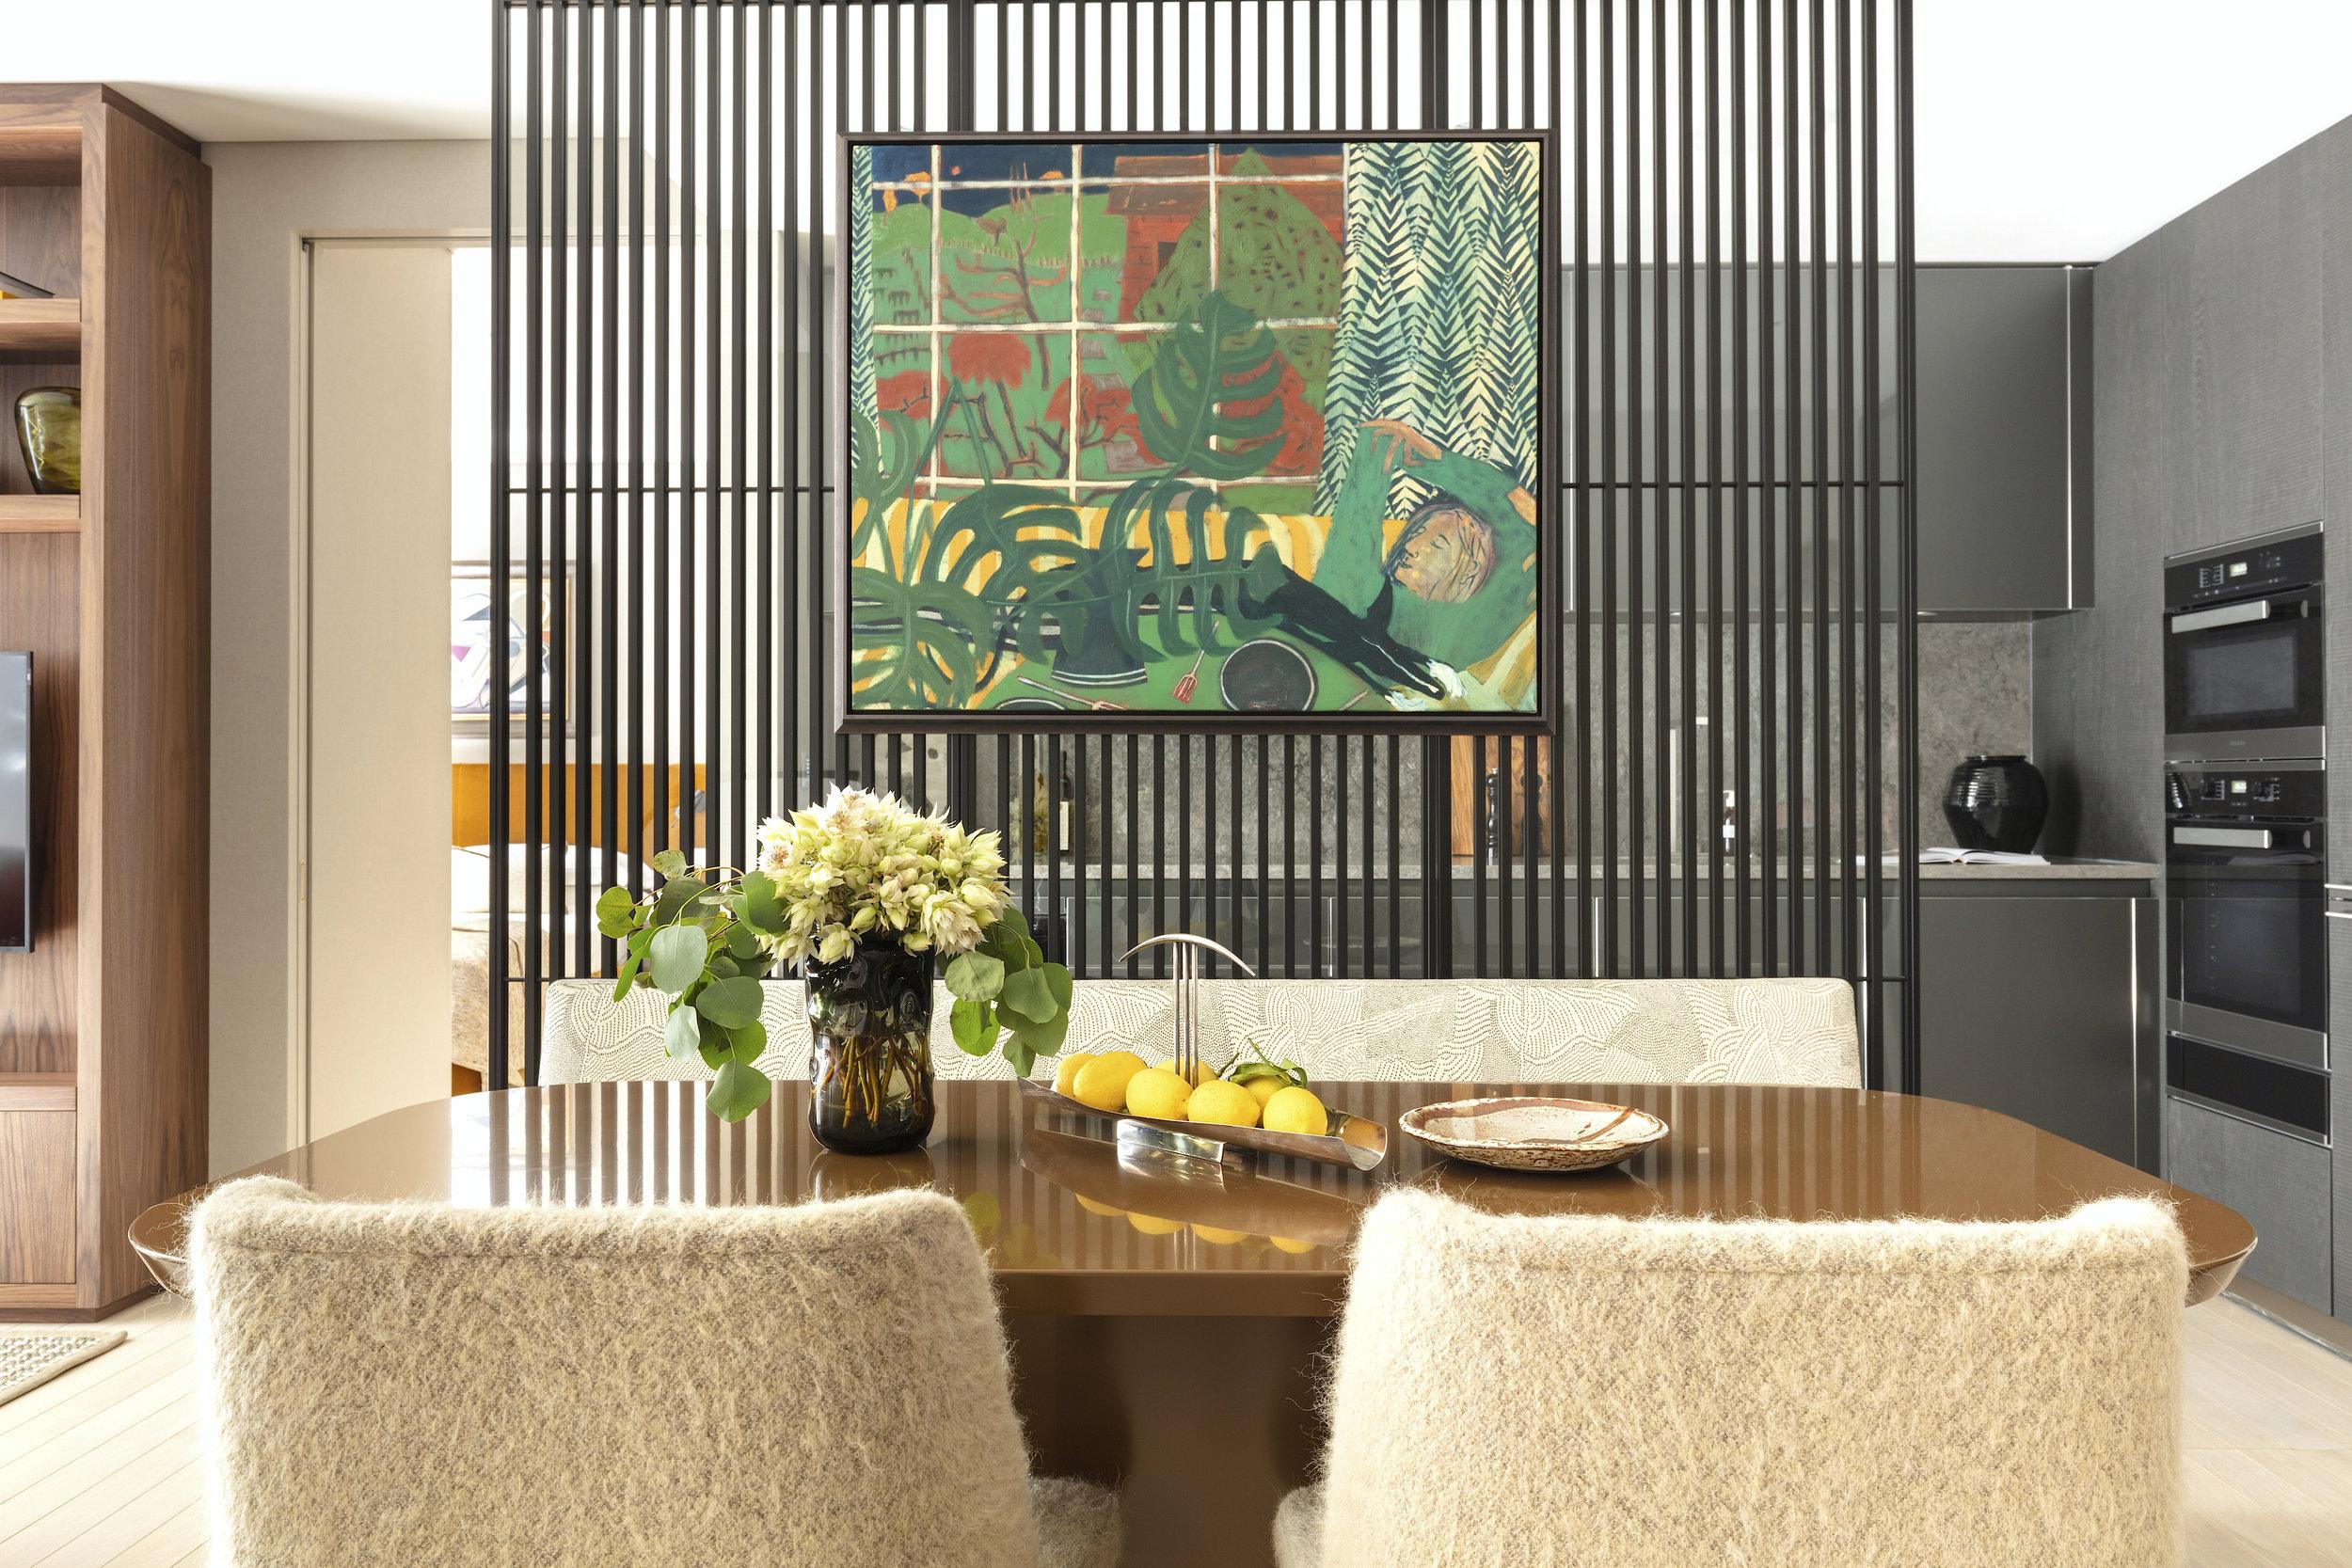 Burlington Gate | London   Dining Room - Oil Painting on Canvas      Interior Design & Architecture: Hudson & Mercer